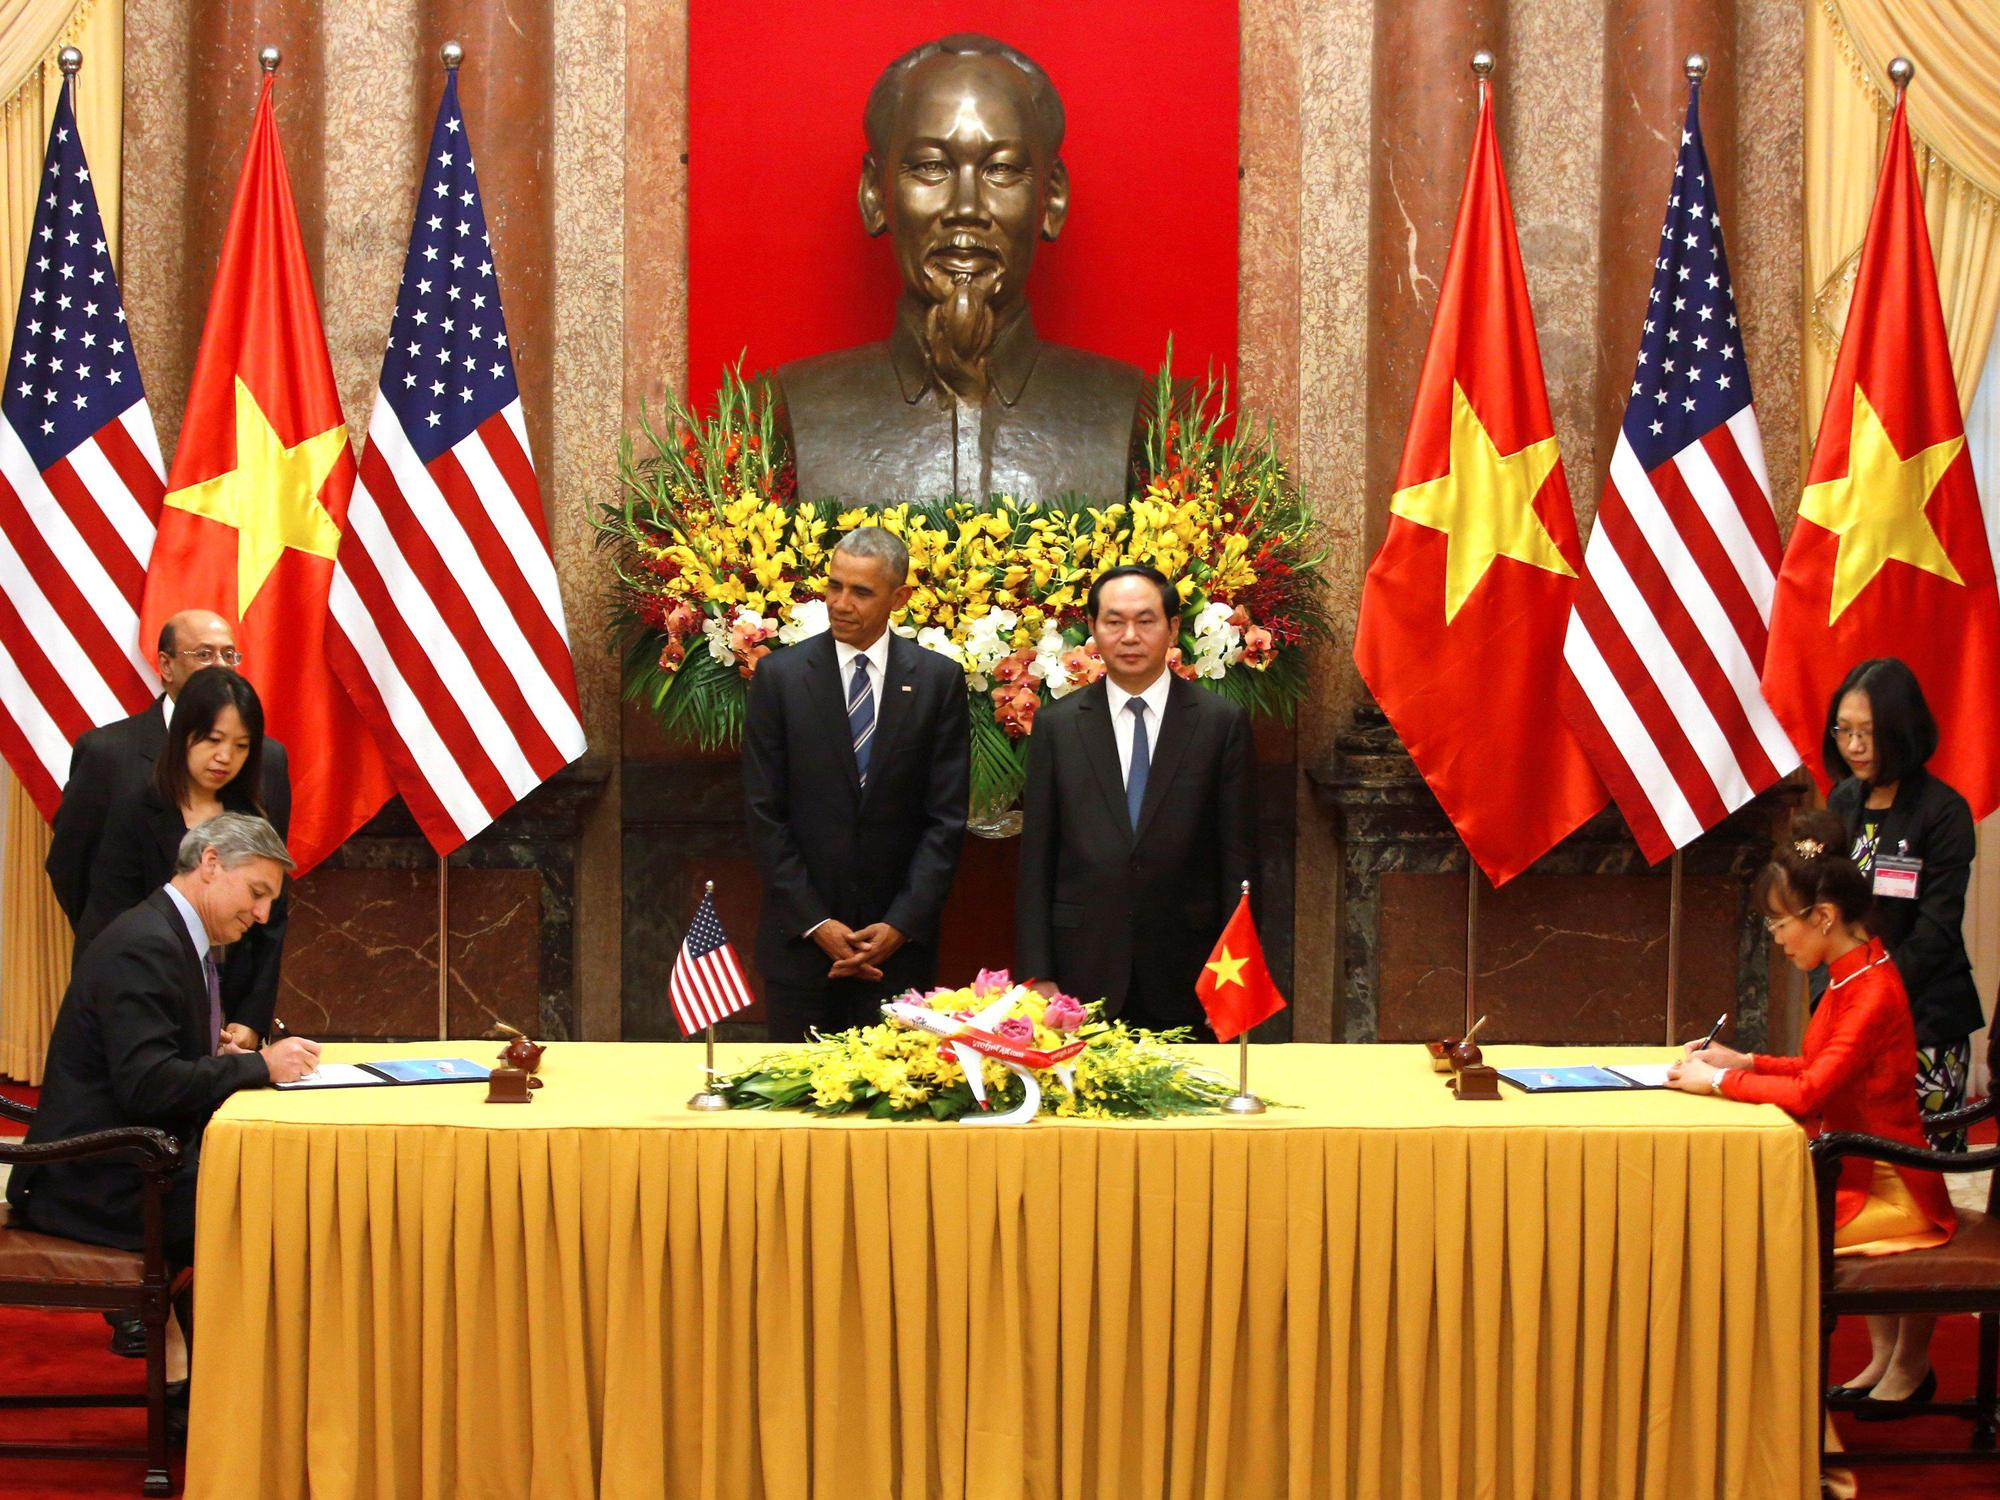 O Αμερικανός πρόεδρος Barack Obama και ο Βιετναμέζος πρόεδρος Tran Dai Quang, παρακολουθούν την υπογραφή της συμφωνίας μεταξύ VietJet και Boeing